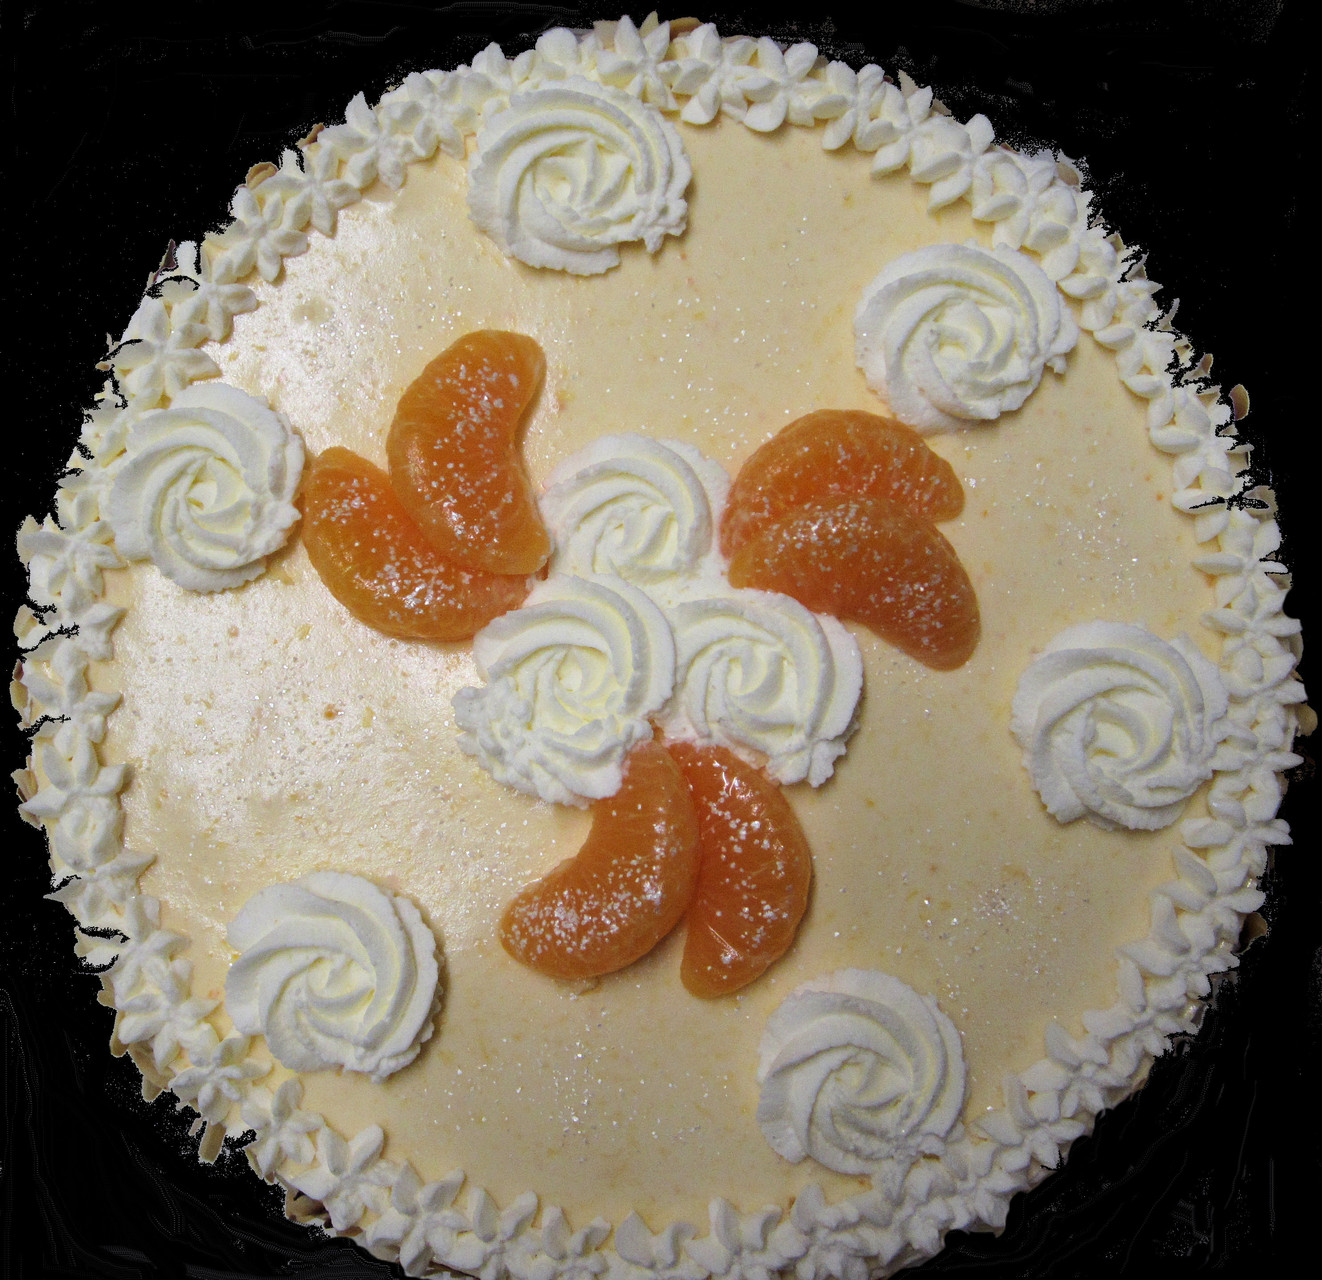 Mandarinen-Joghurt-Quarktorte